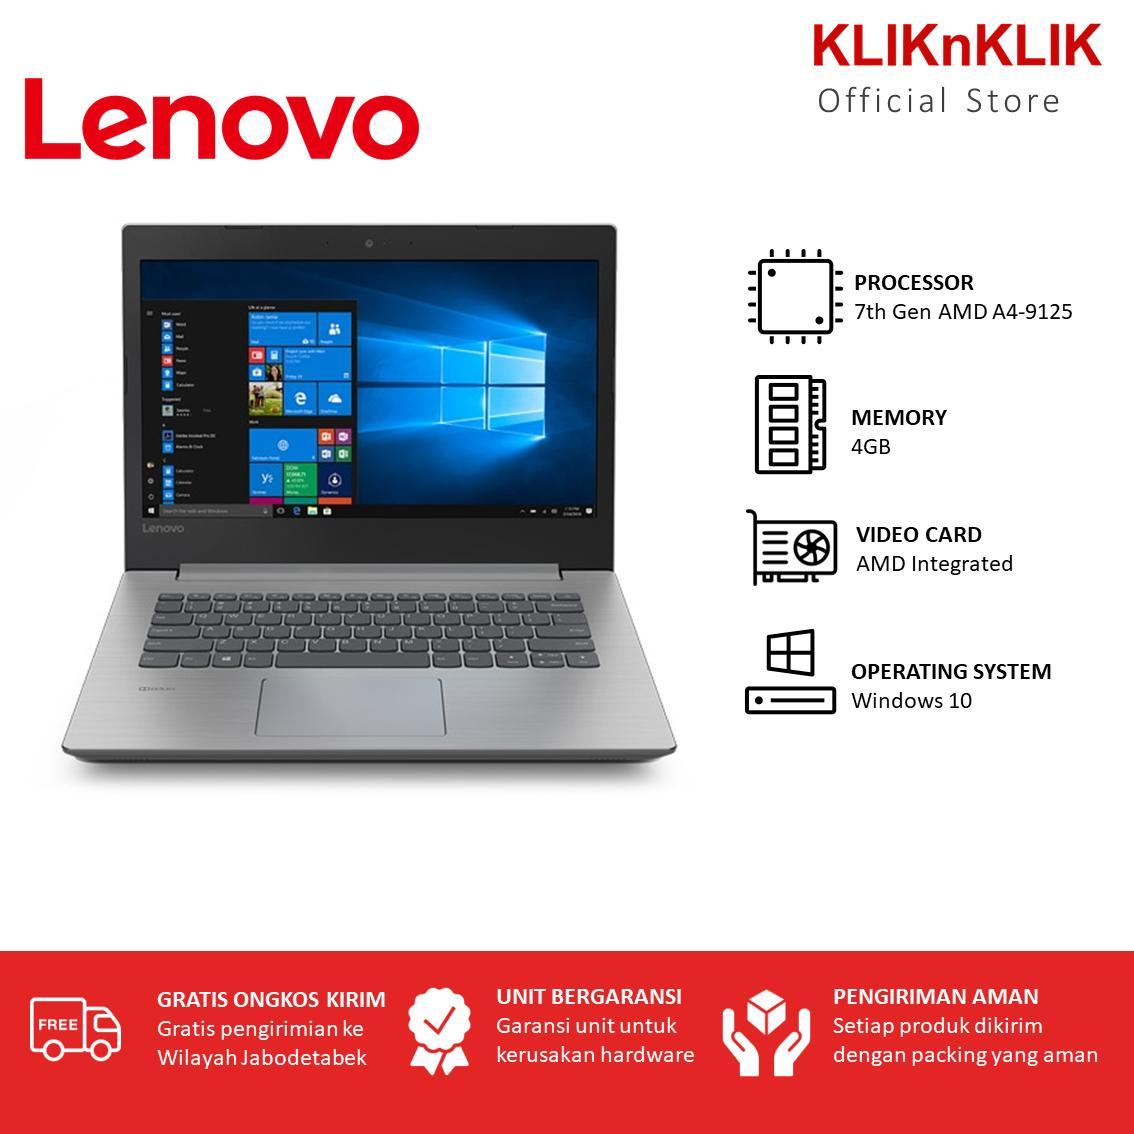 LENOVO IdeaPad 330-14AST - RAM 4GB - AMD A4-9125 - 14 Inch - Windows 10 - Platinum Grey - Laptop Murah